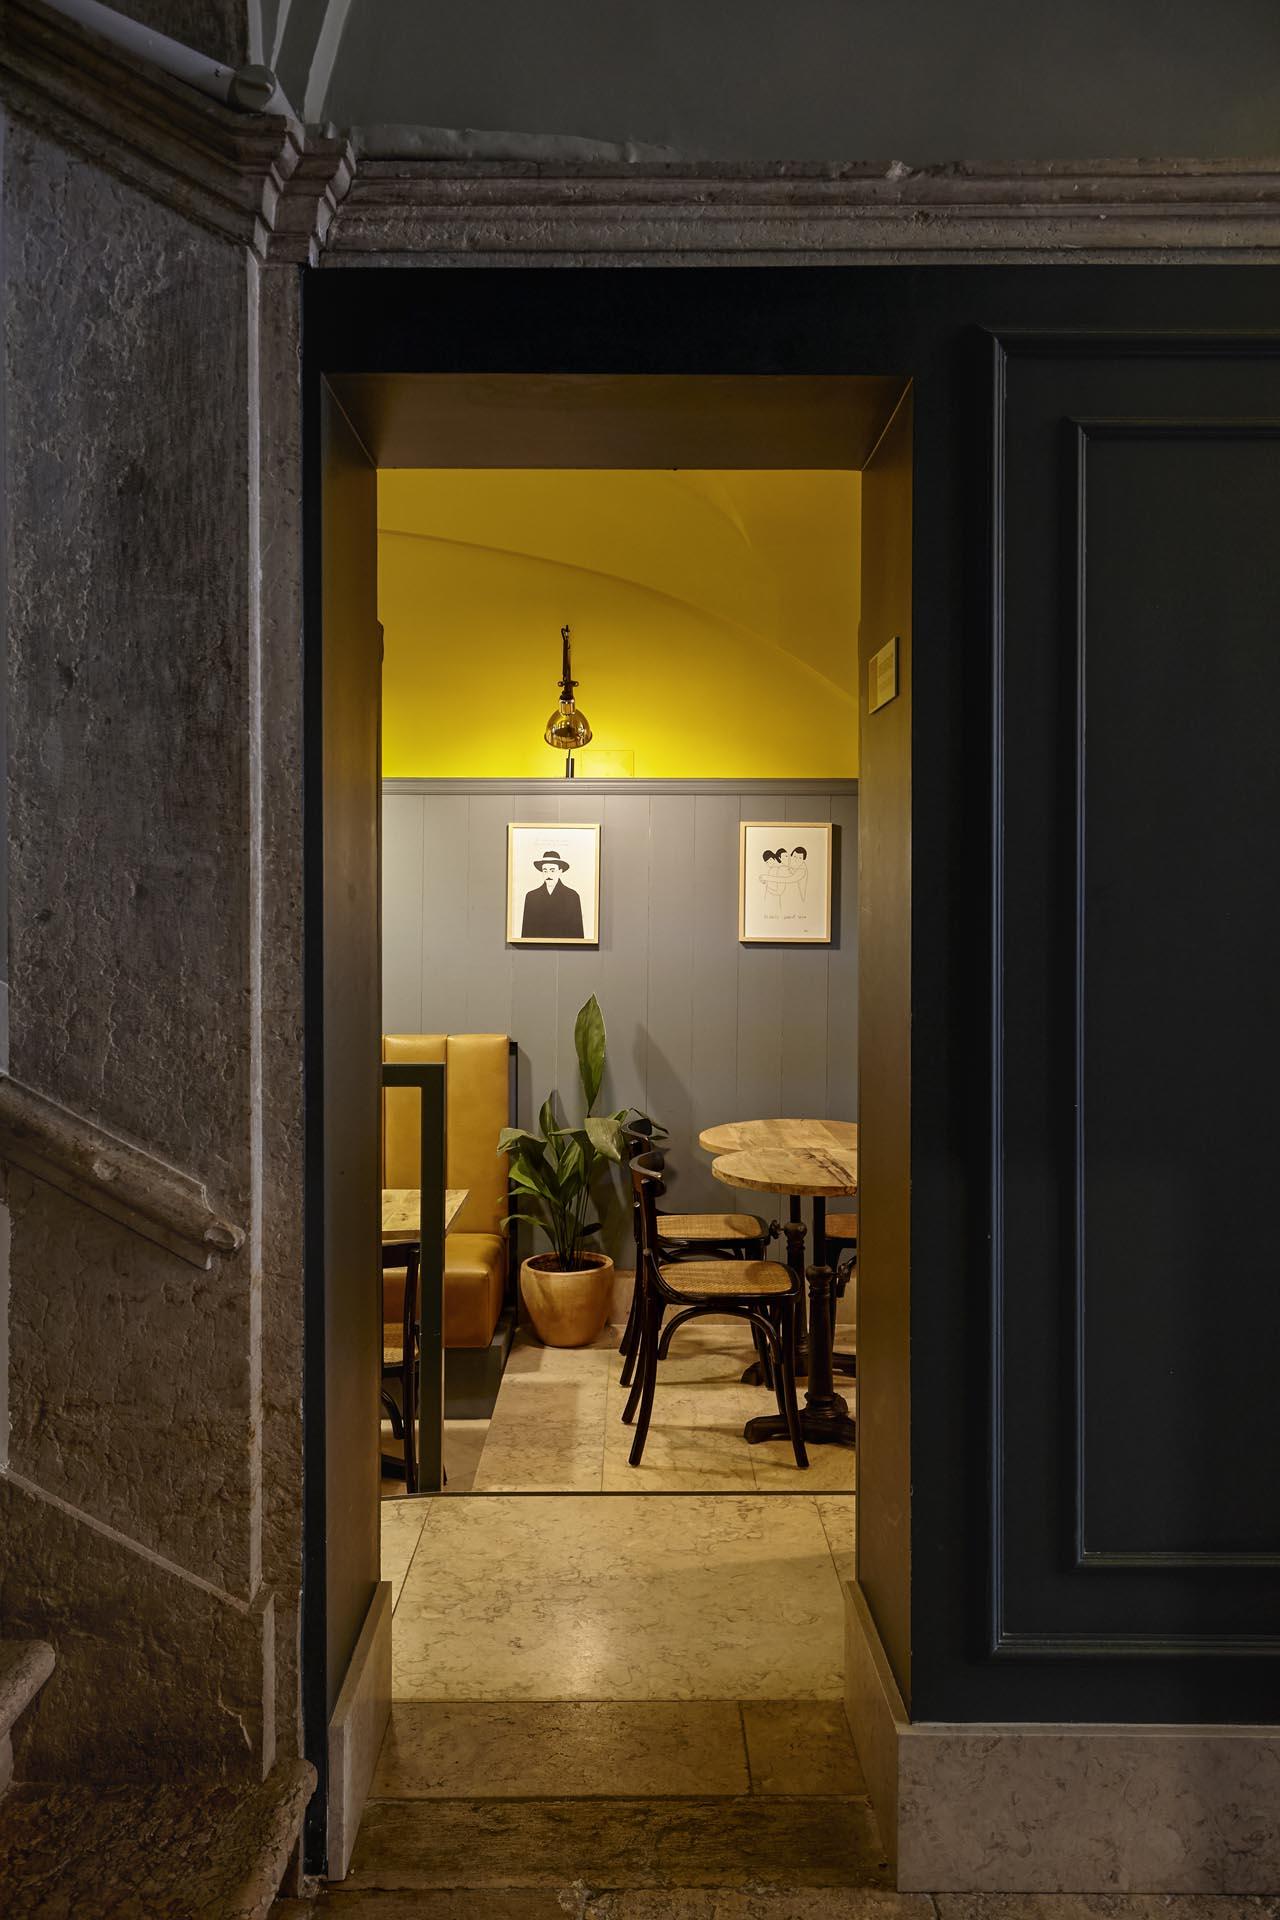 Oficina Marques interior design quinta colina (26).jpg